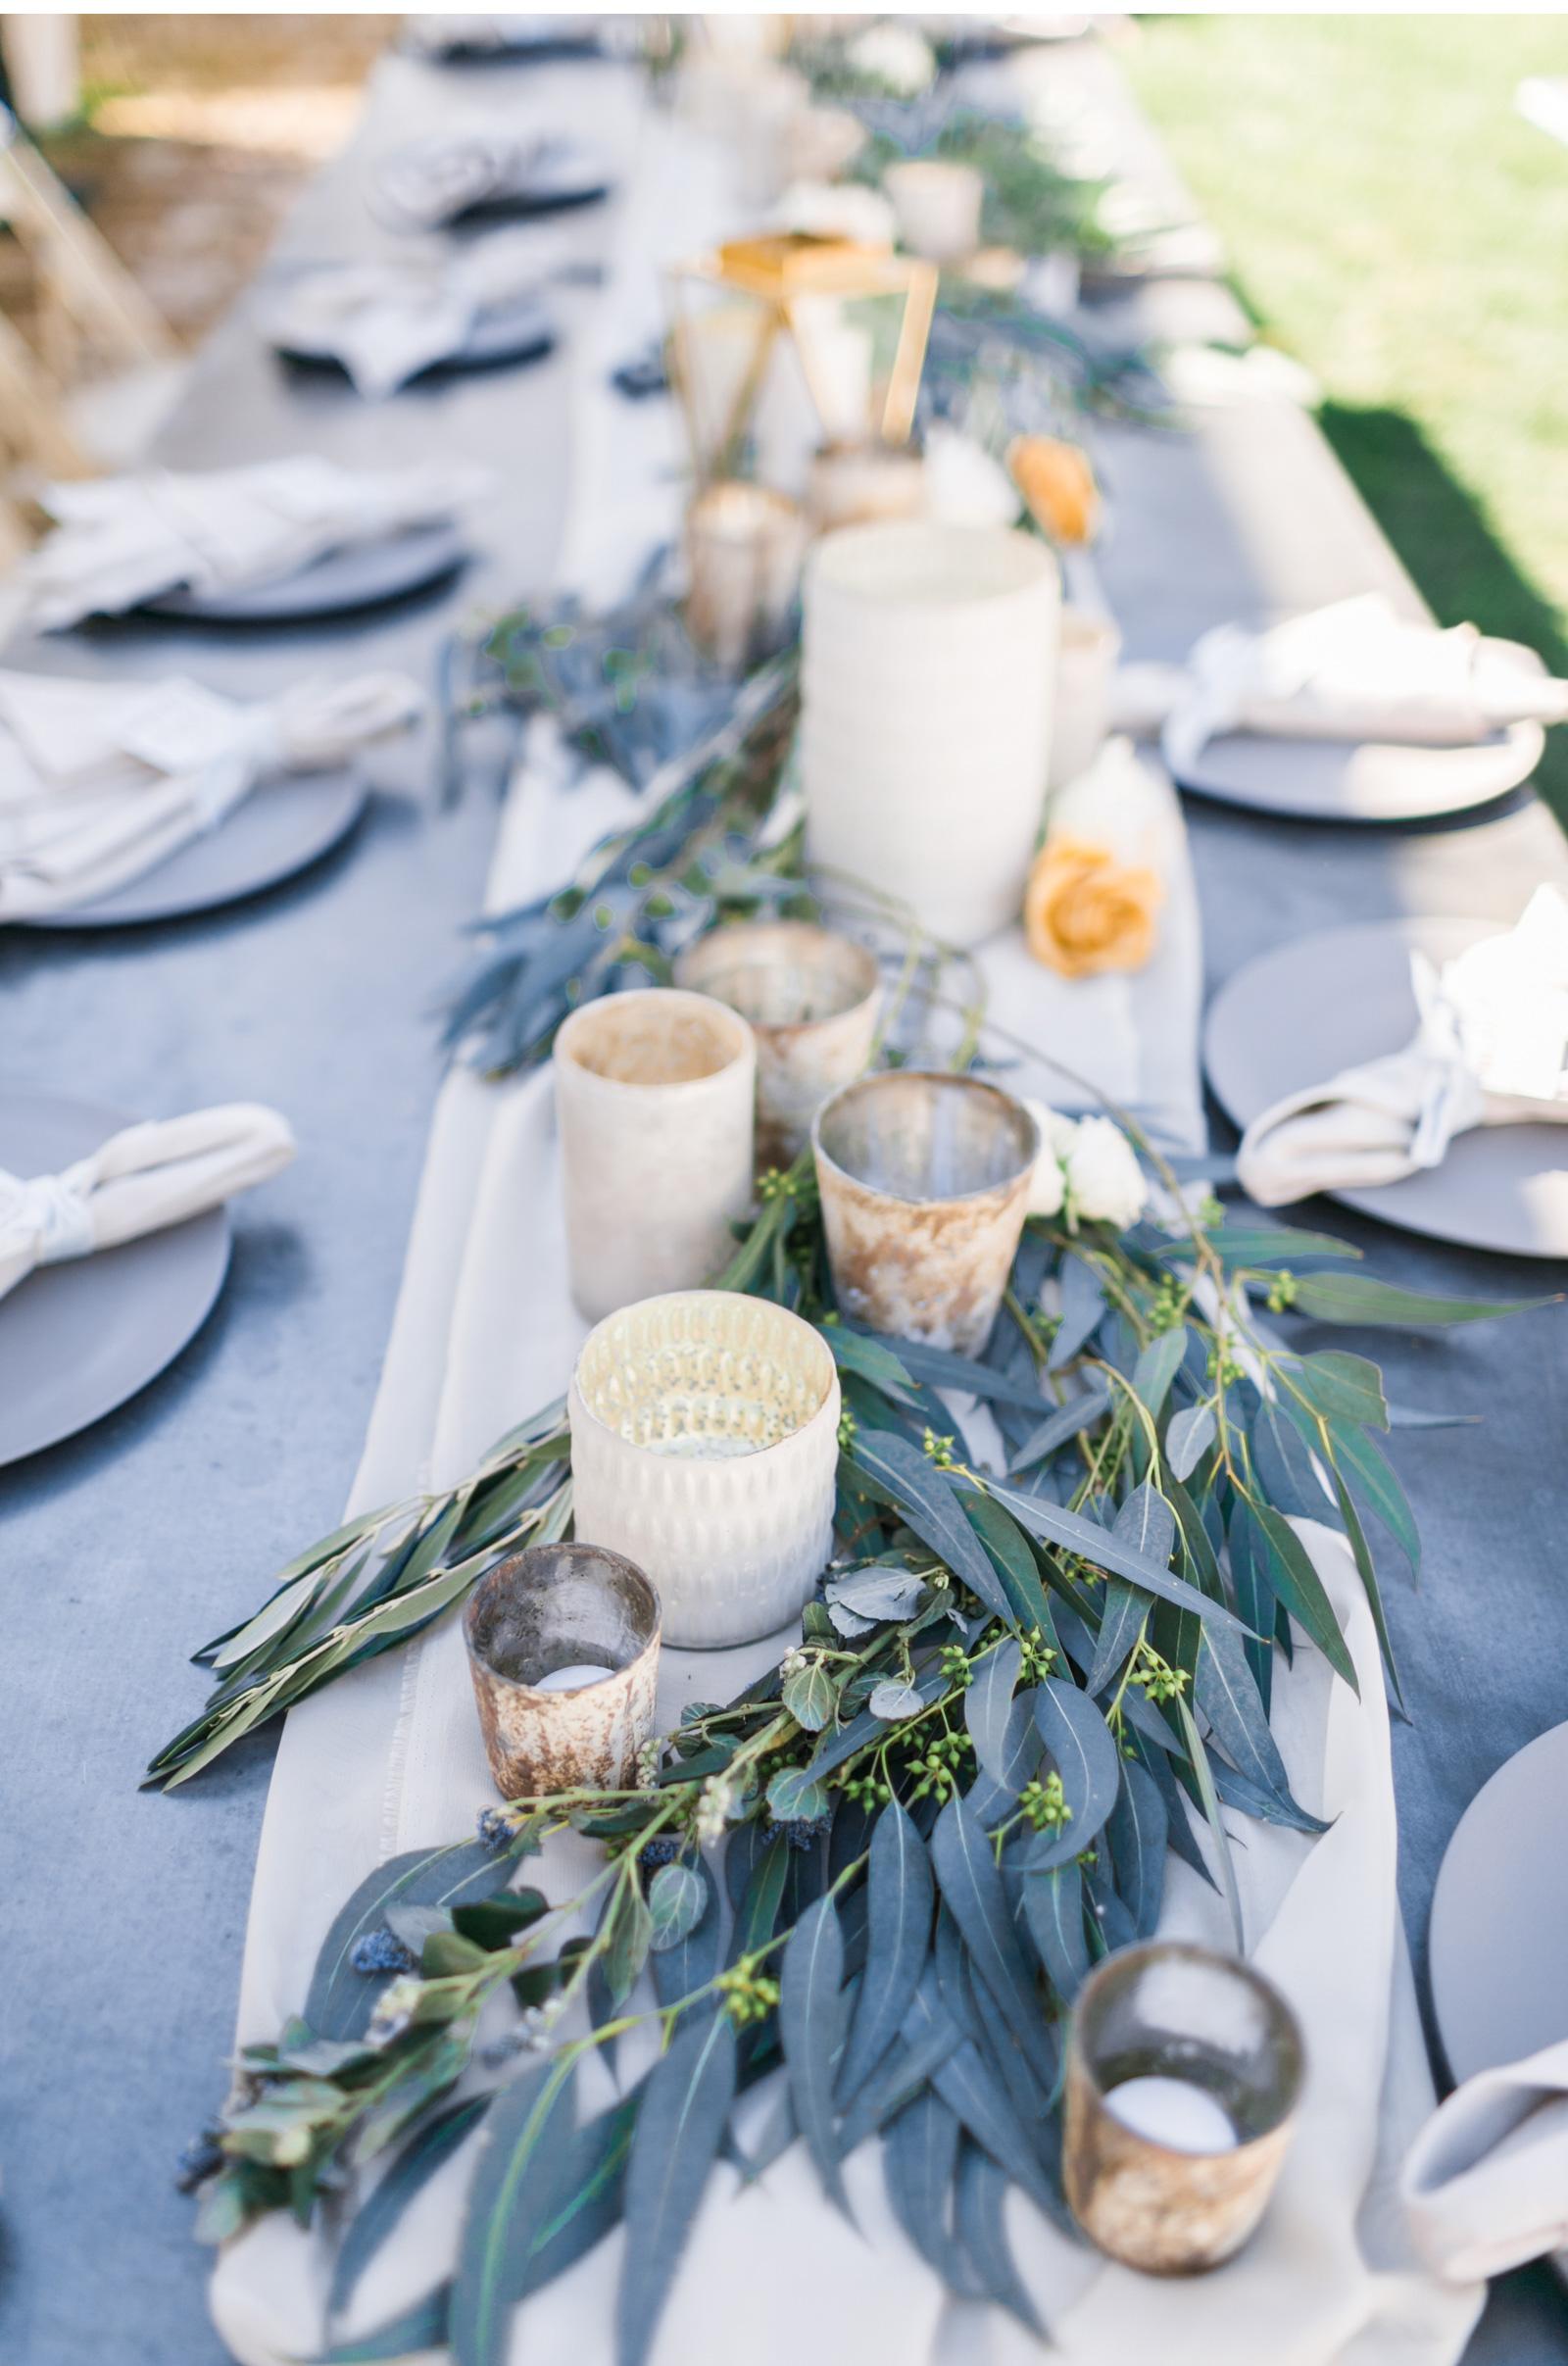 Triunfo-Creek-Malibu-Wedding-Natalie-Schutt-Photography-Couture-Events-Style-Me-Pretty_12.jpg